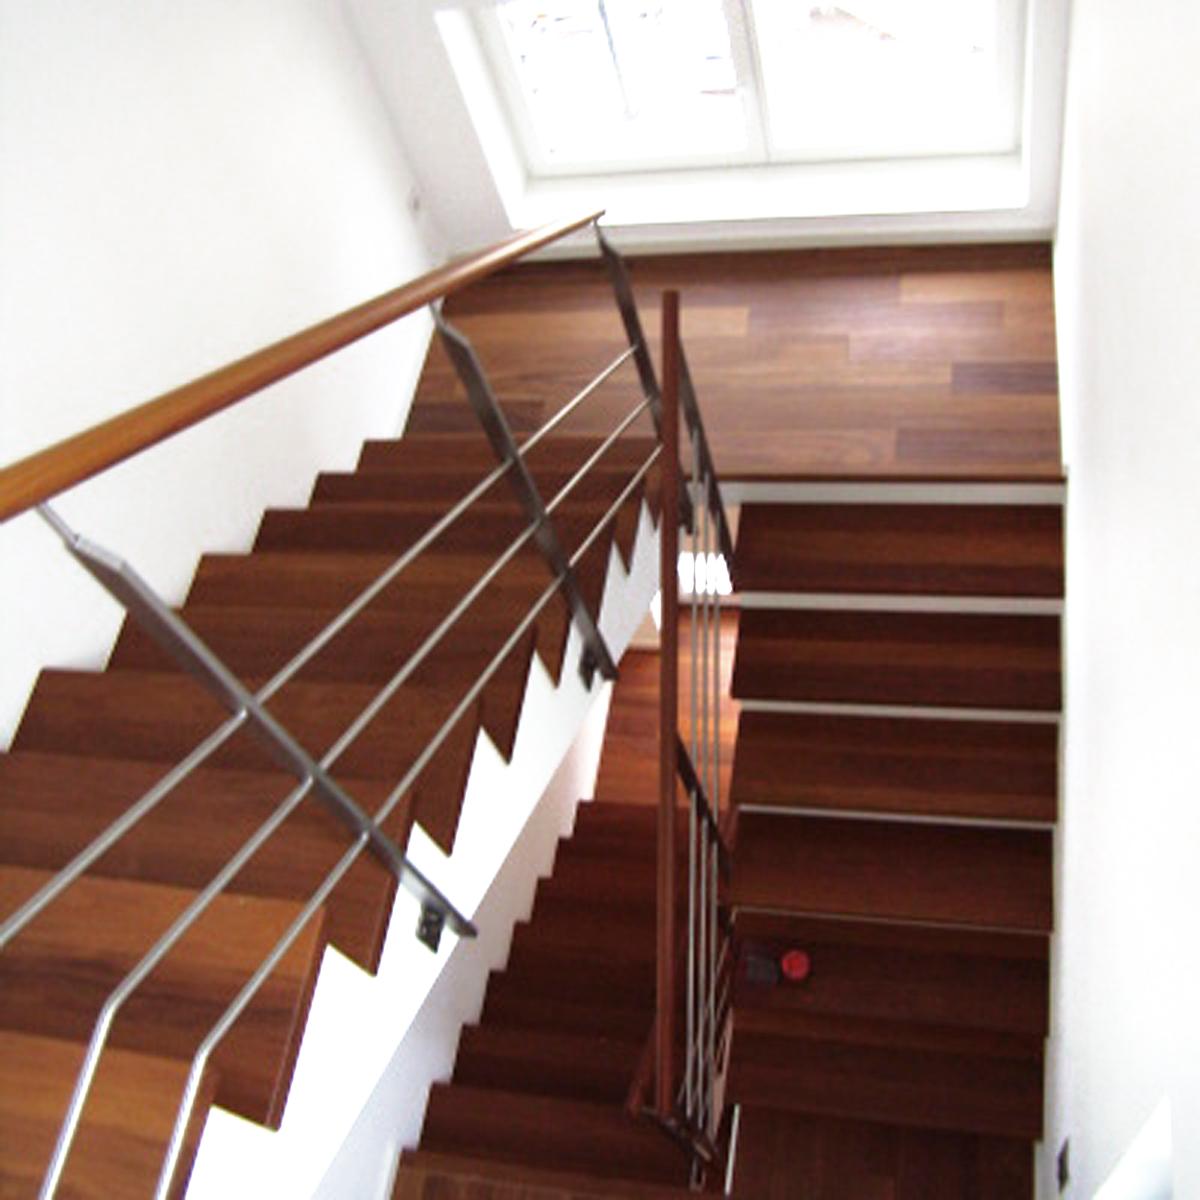 stufen auf beton 8 middendorf. Black Bedroom Furniture Sets. Home Design Ideas